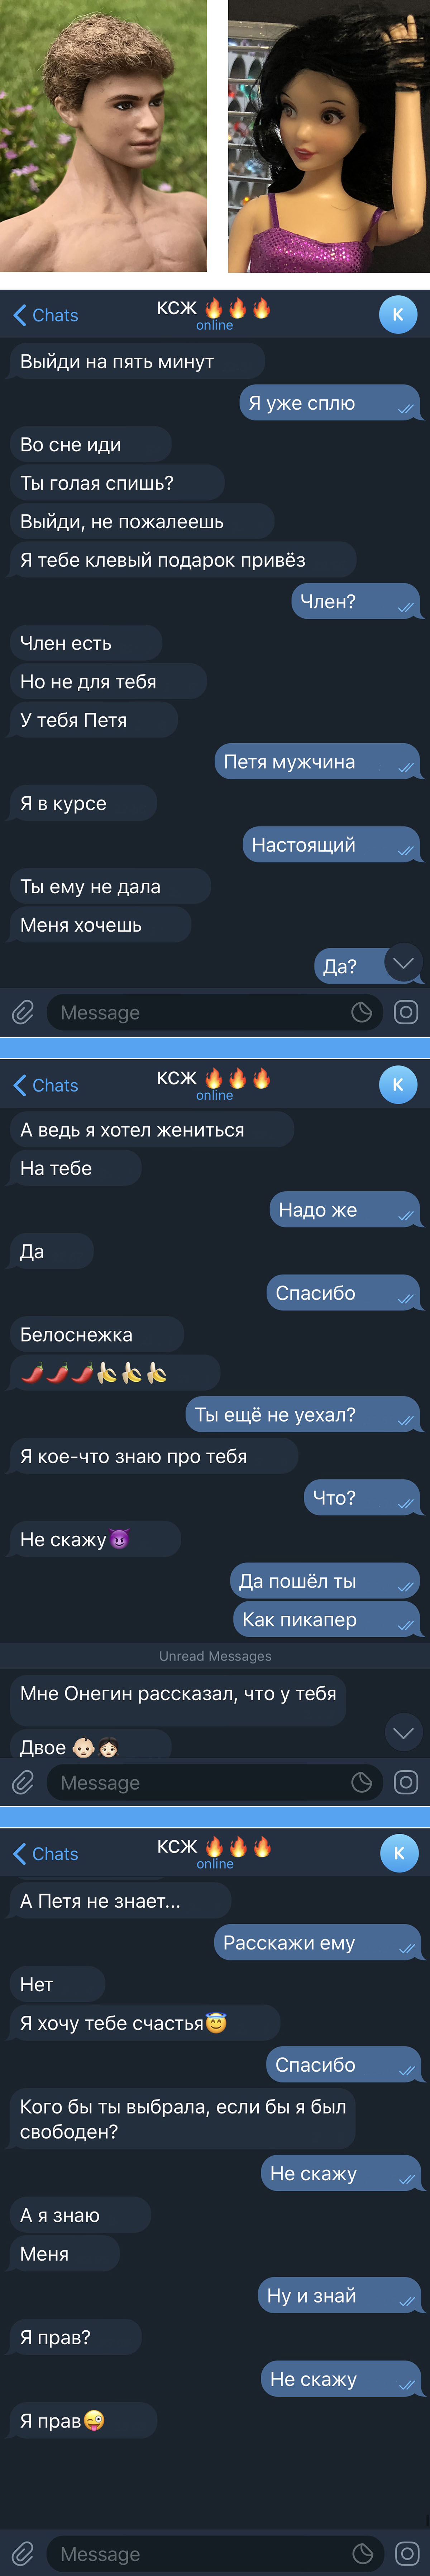 Telegram КСЖ – Белоснежка